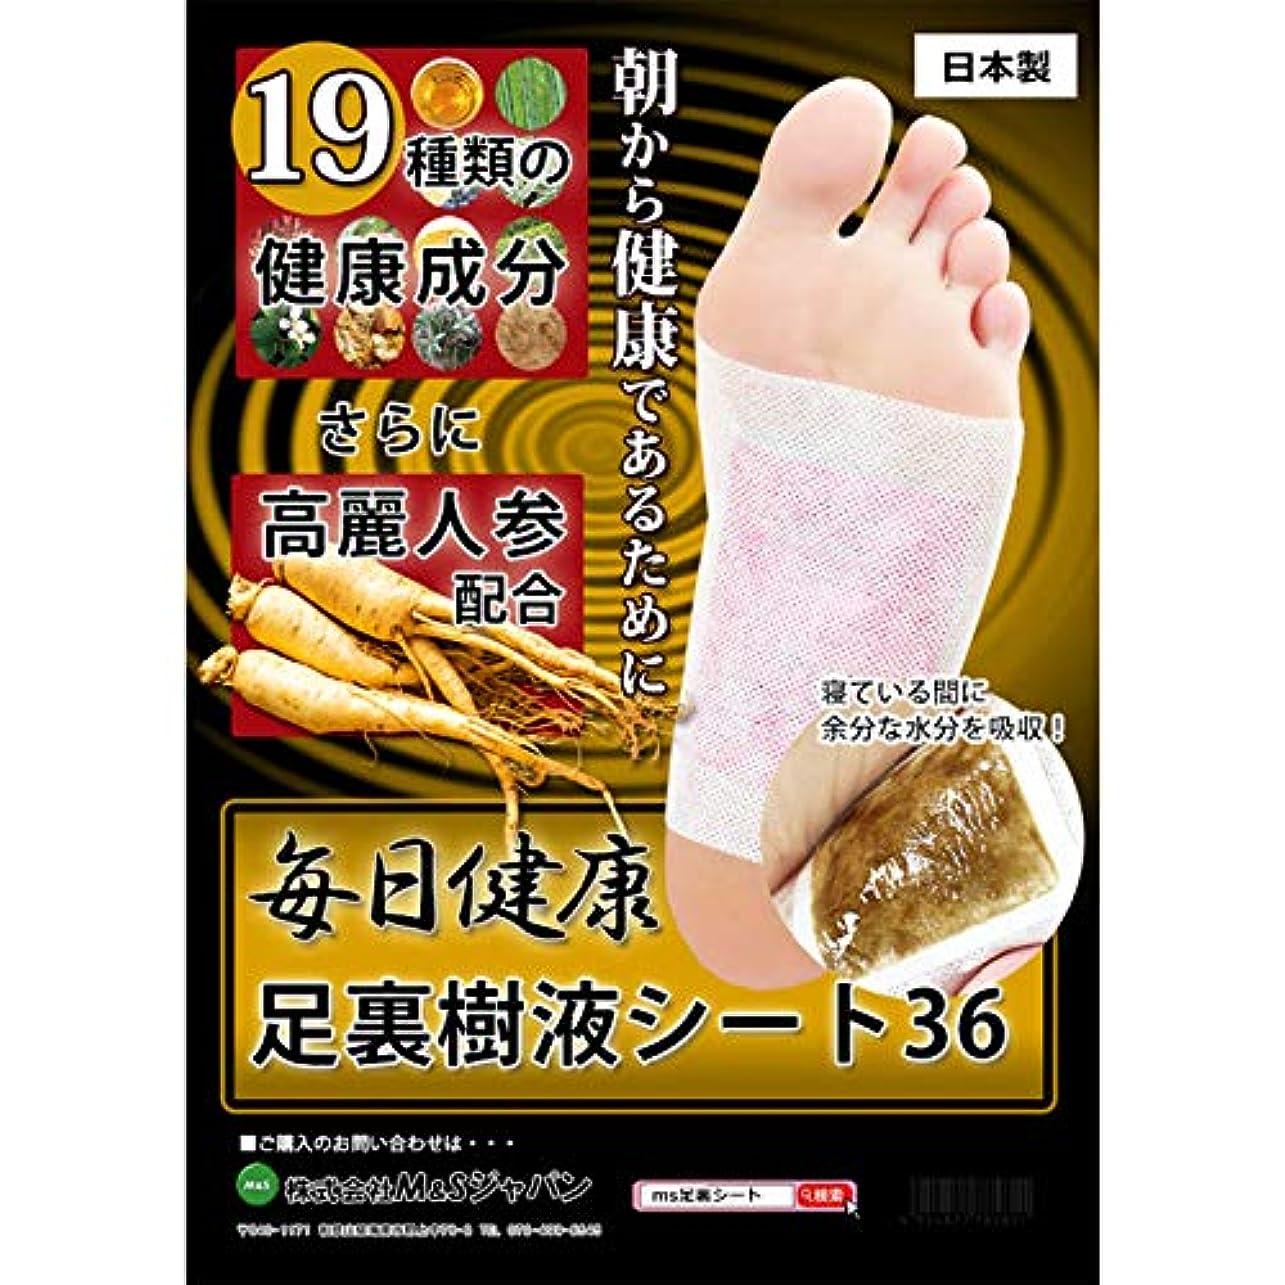 矩形書店米ドル毎日 健康 足裏樹液シート 高麗人参入り+19種類の健康成分 36枚 日本製